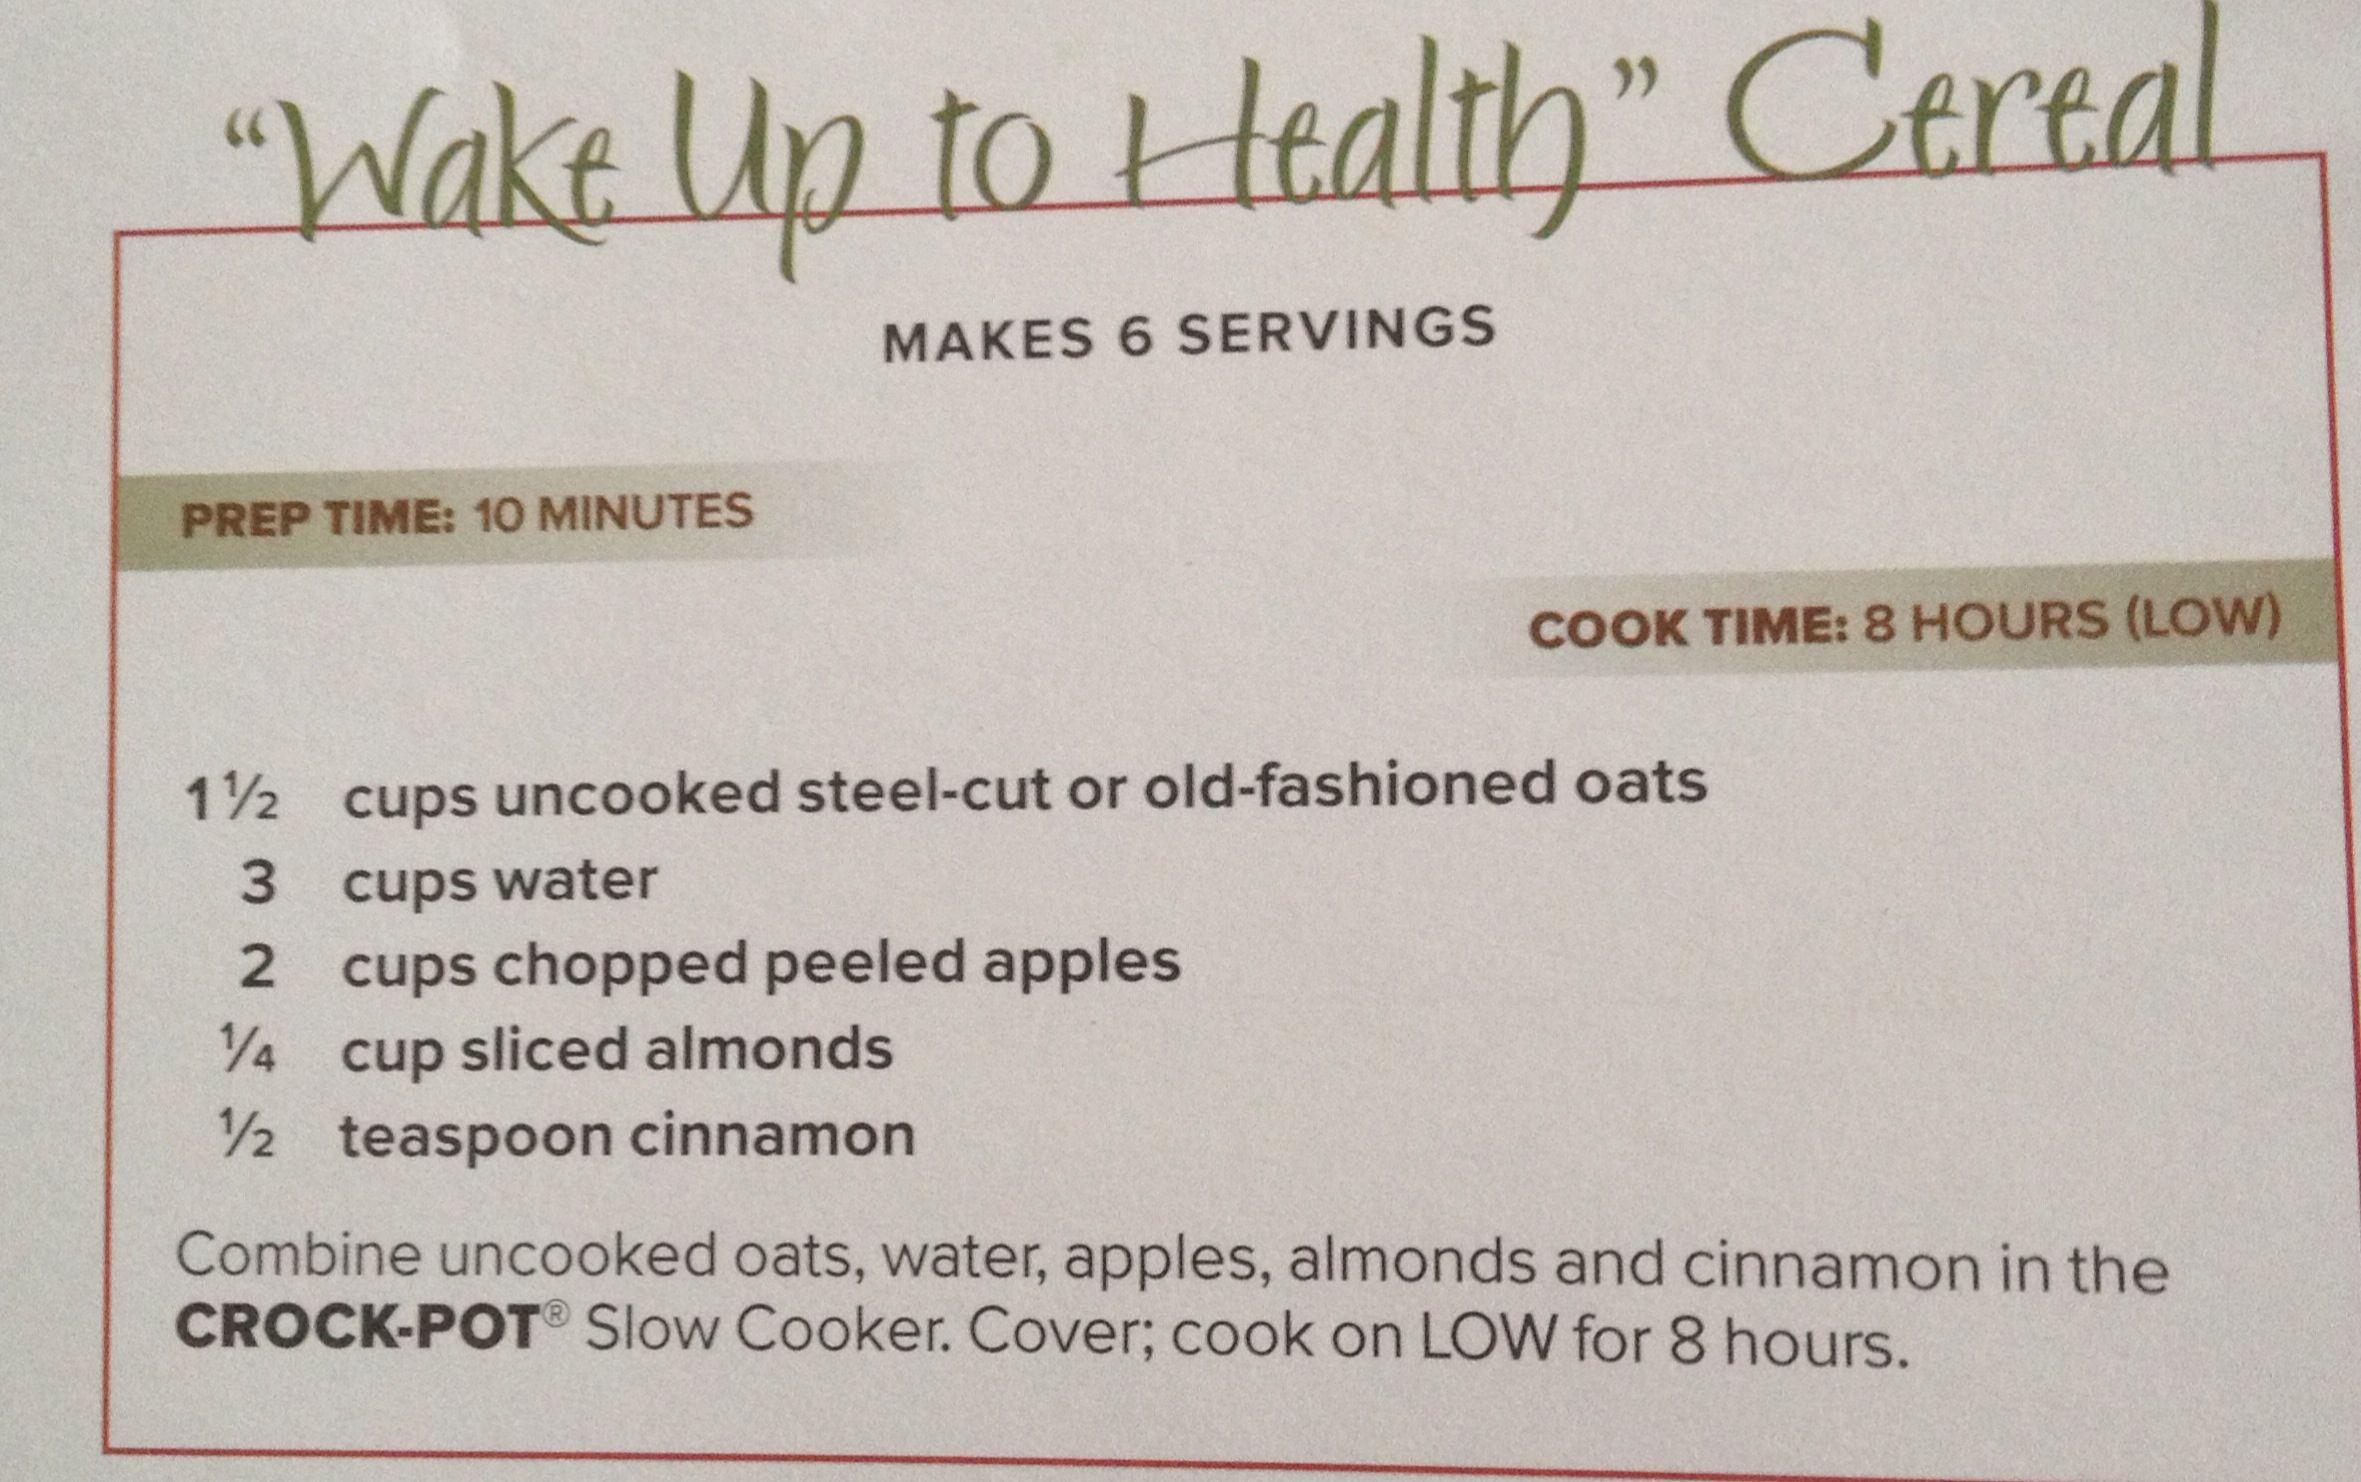 Pin by Liz Carpenter on Recipes I wanna try | Pinterest